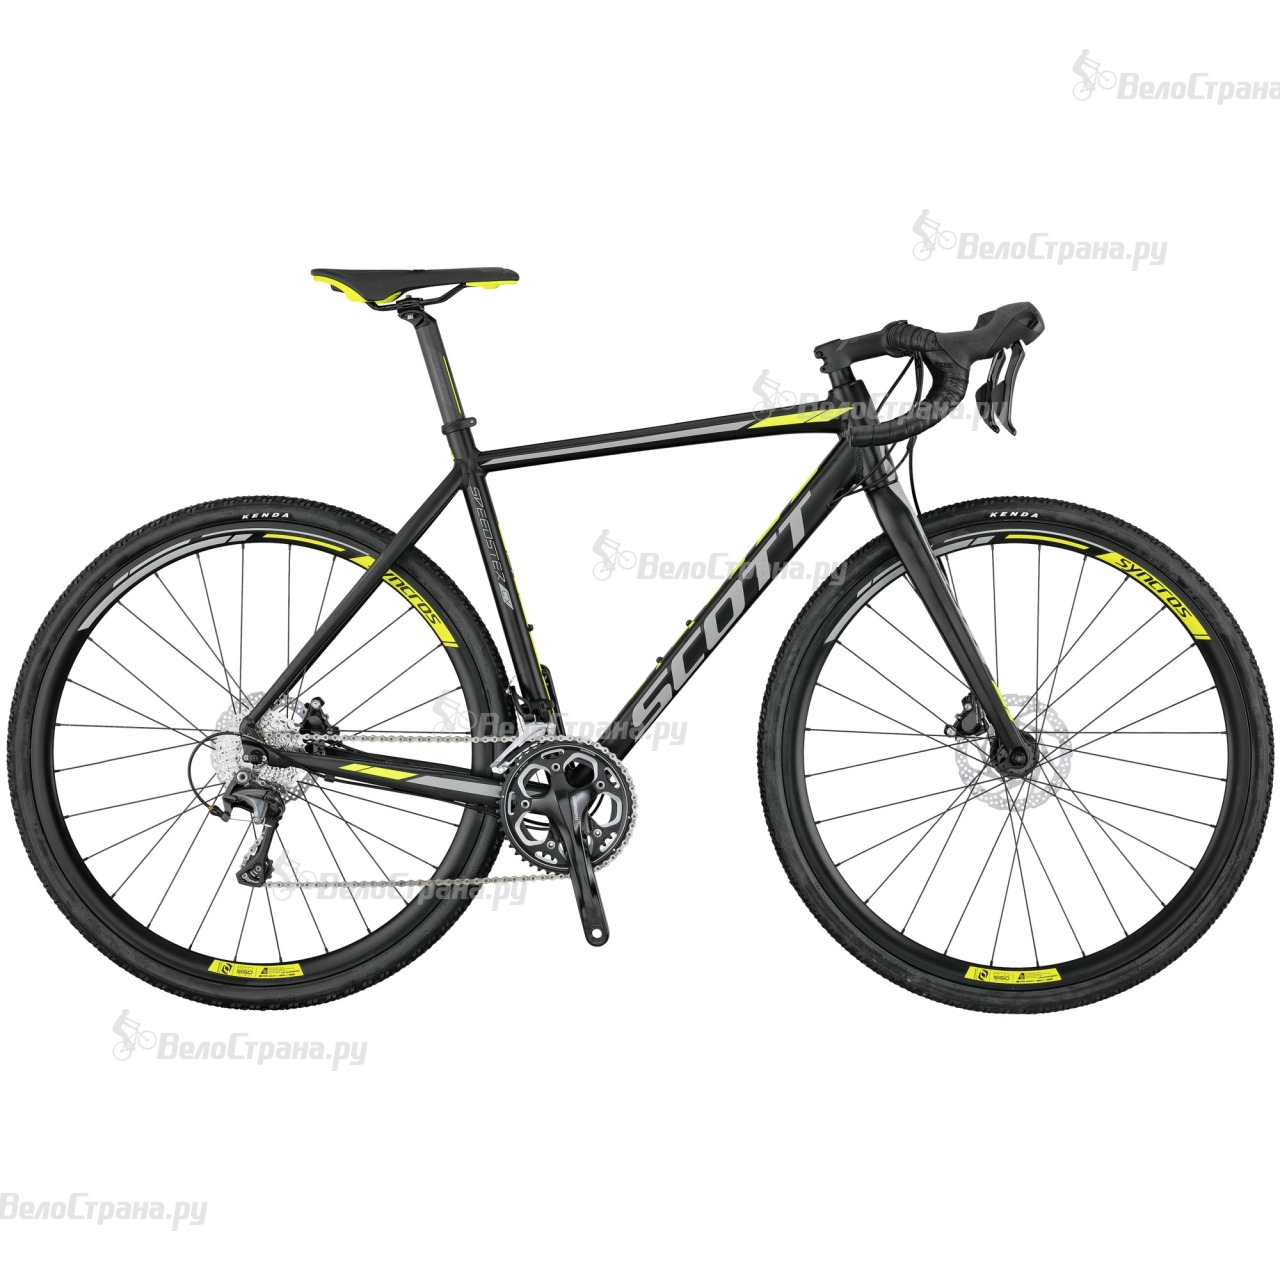 Велосипед Scott Speedster CX 10 Disc (2017) велосипед scott speedster cx 20 disc 28 2016